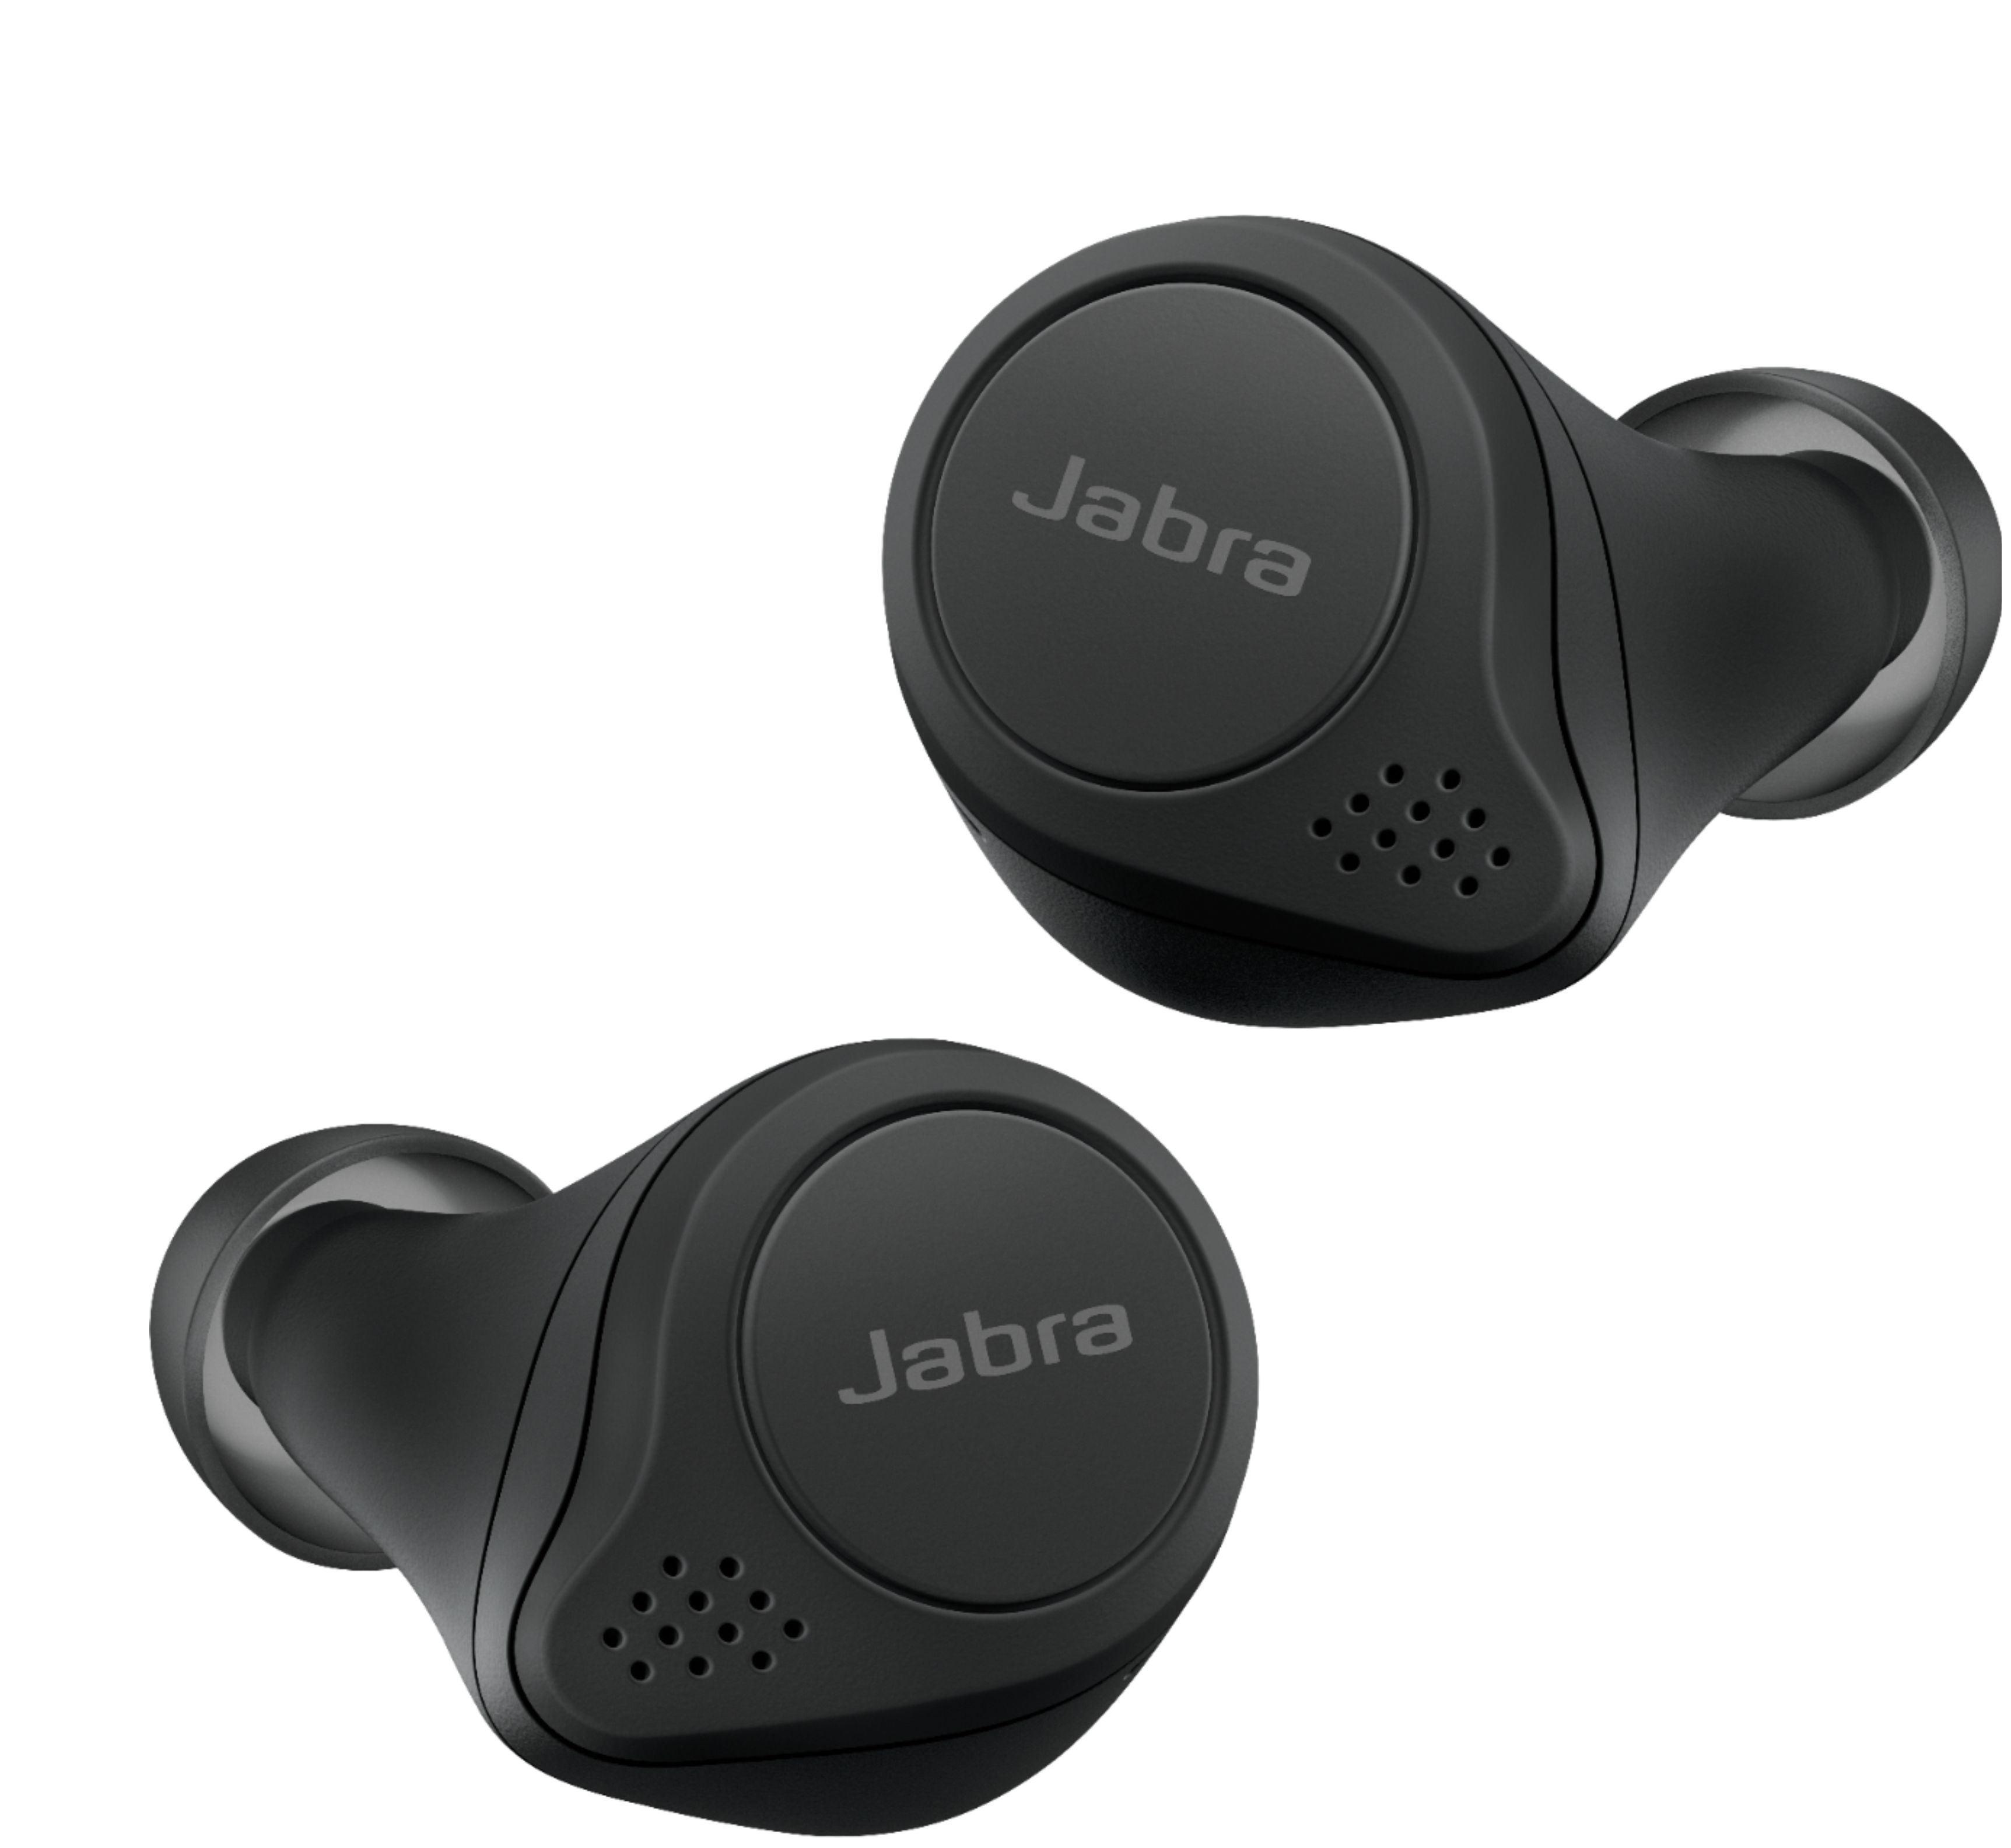 Jabra Elite 75t Headphones